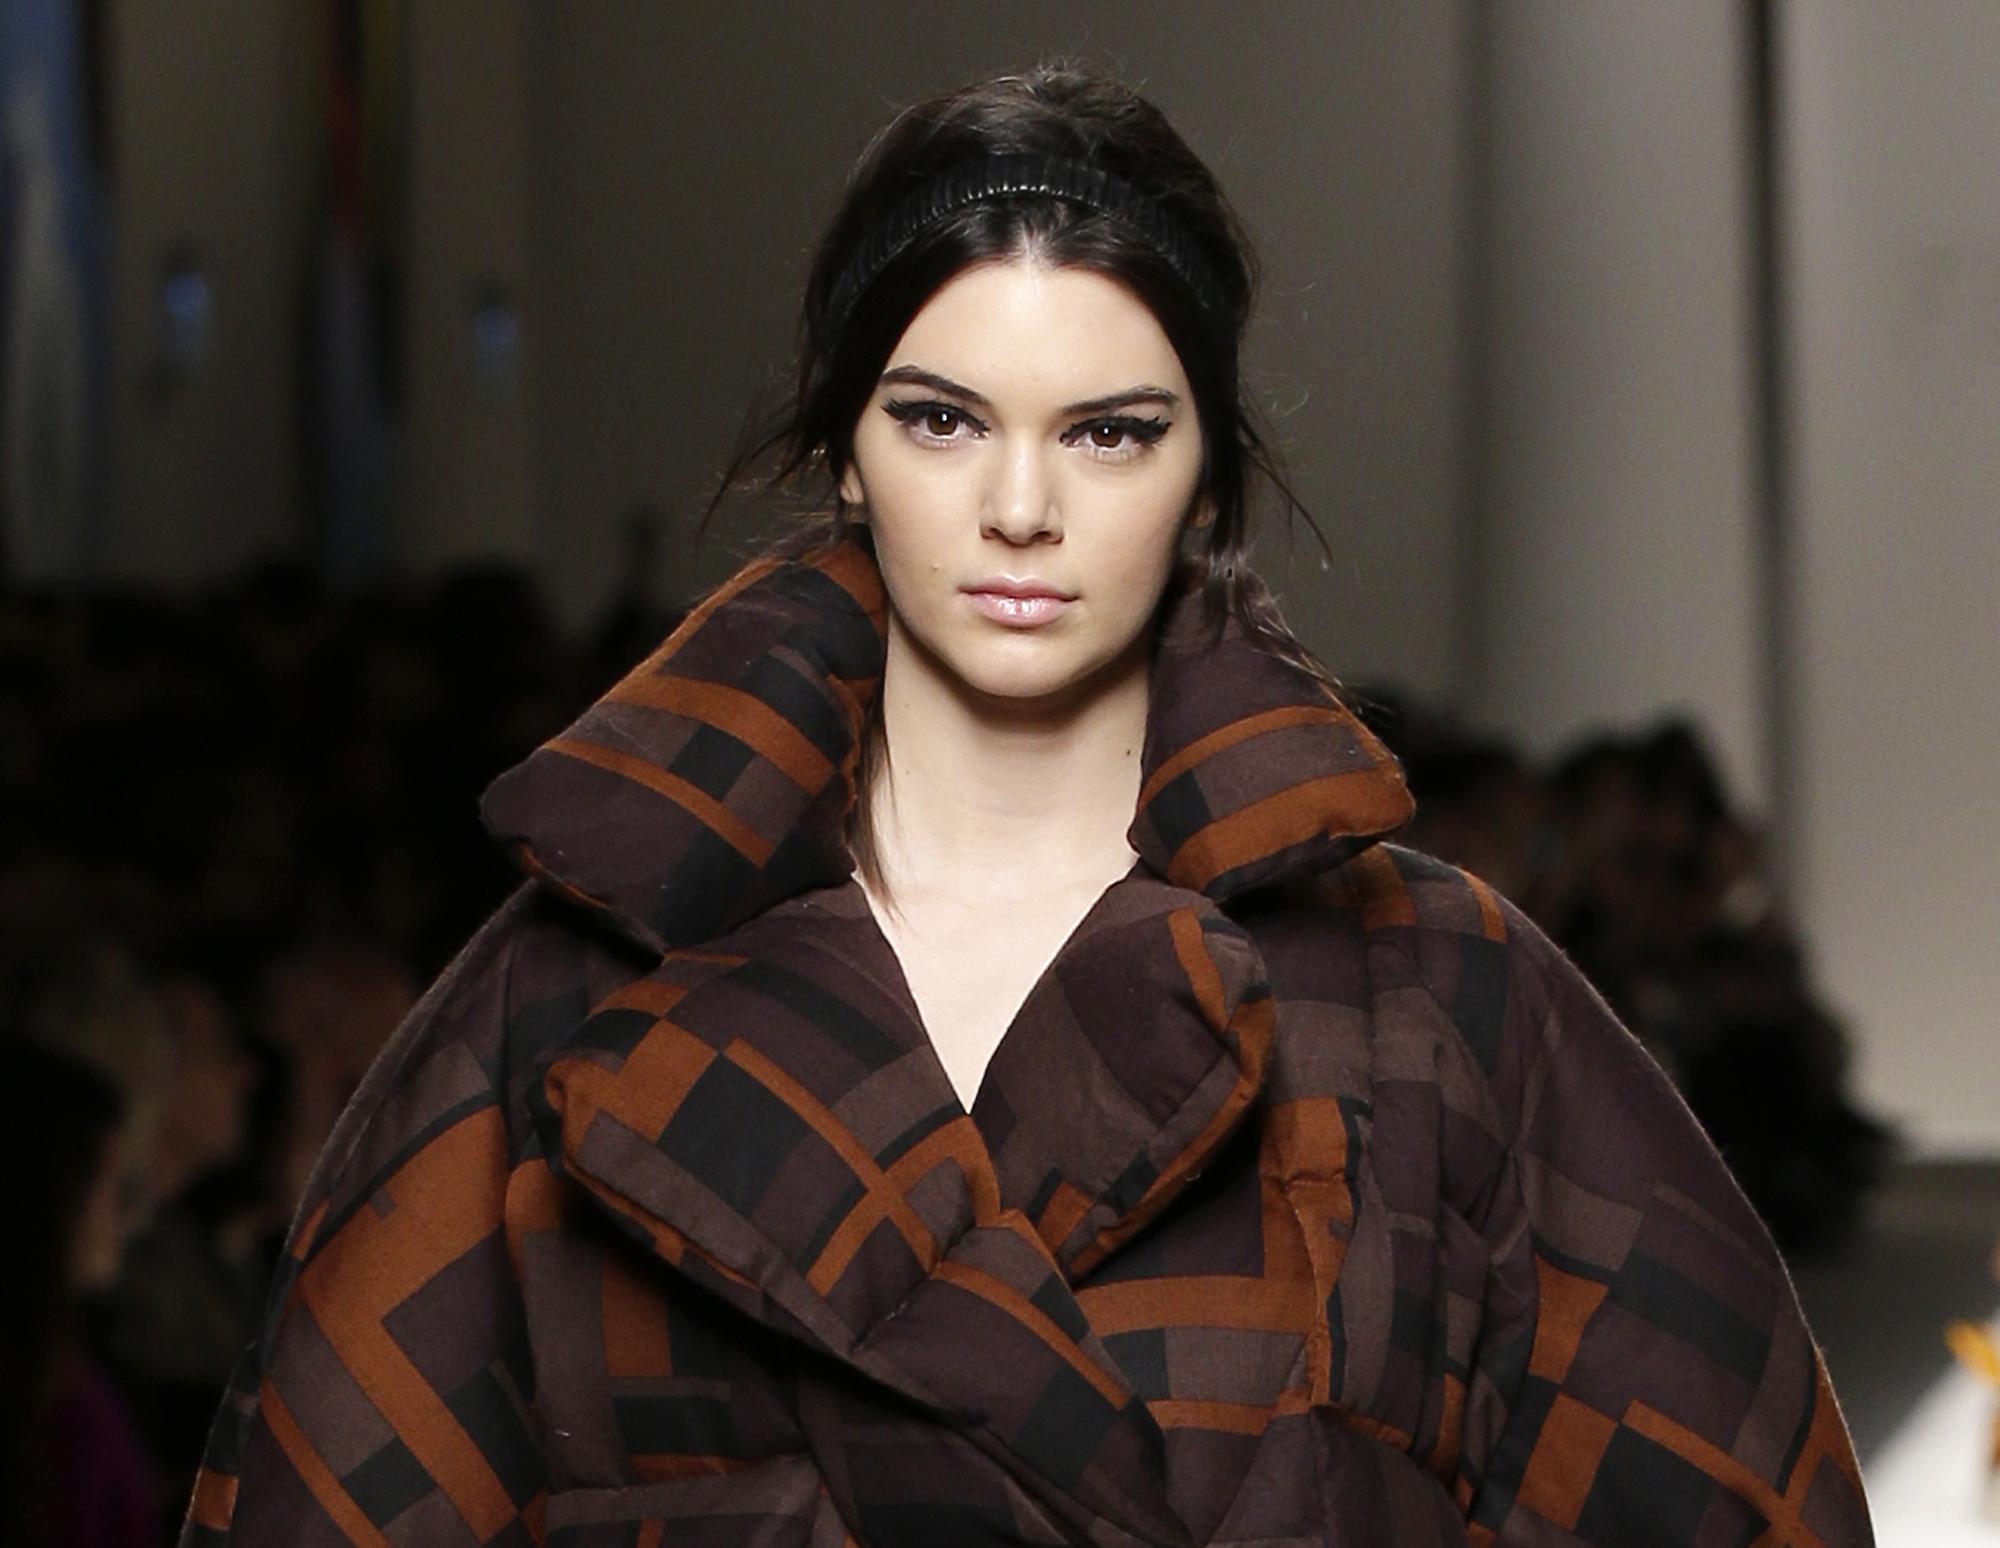 Kendall Jenner struts for Fendi, Kate Mara cozy in Max Mara